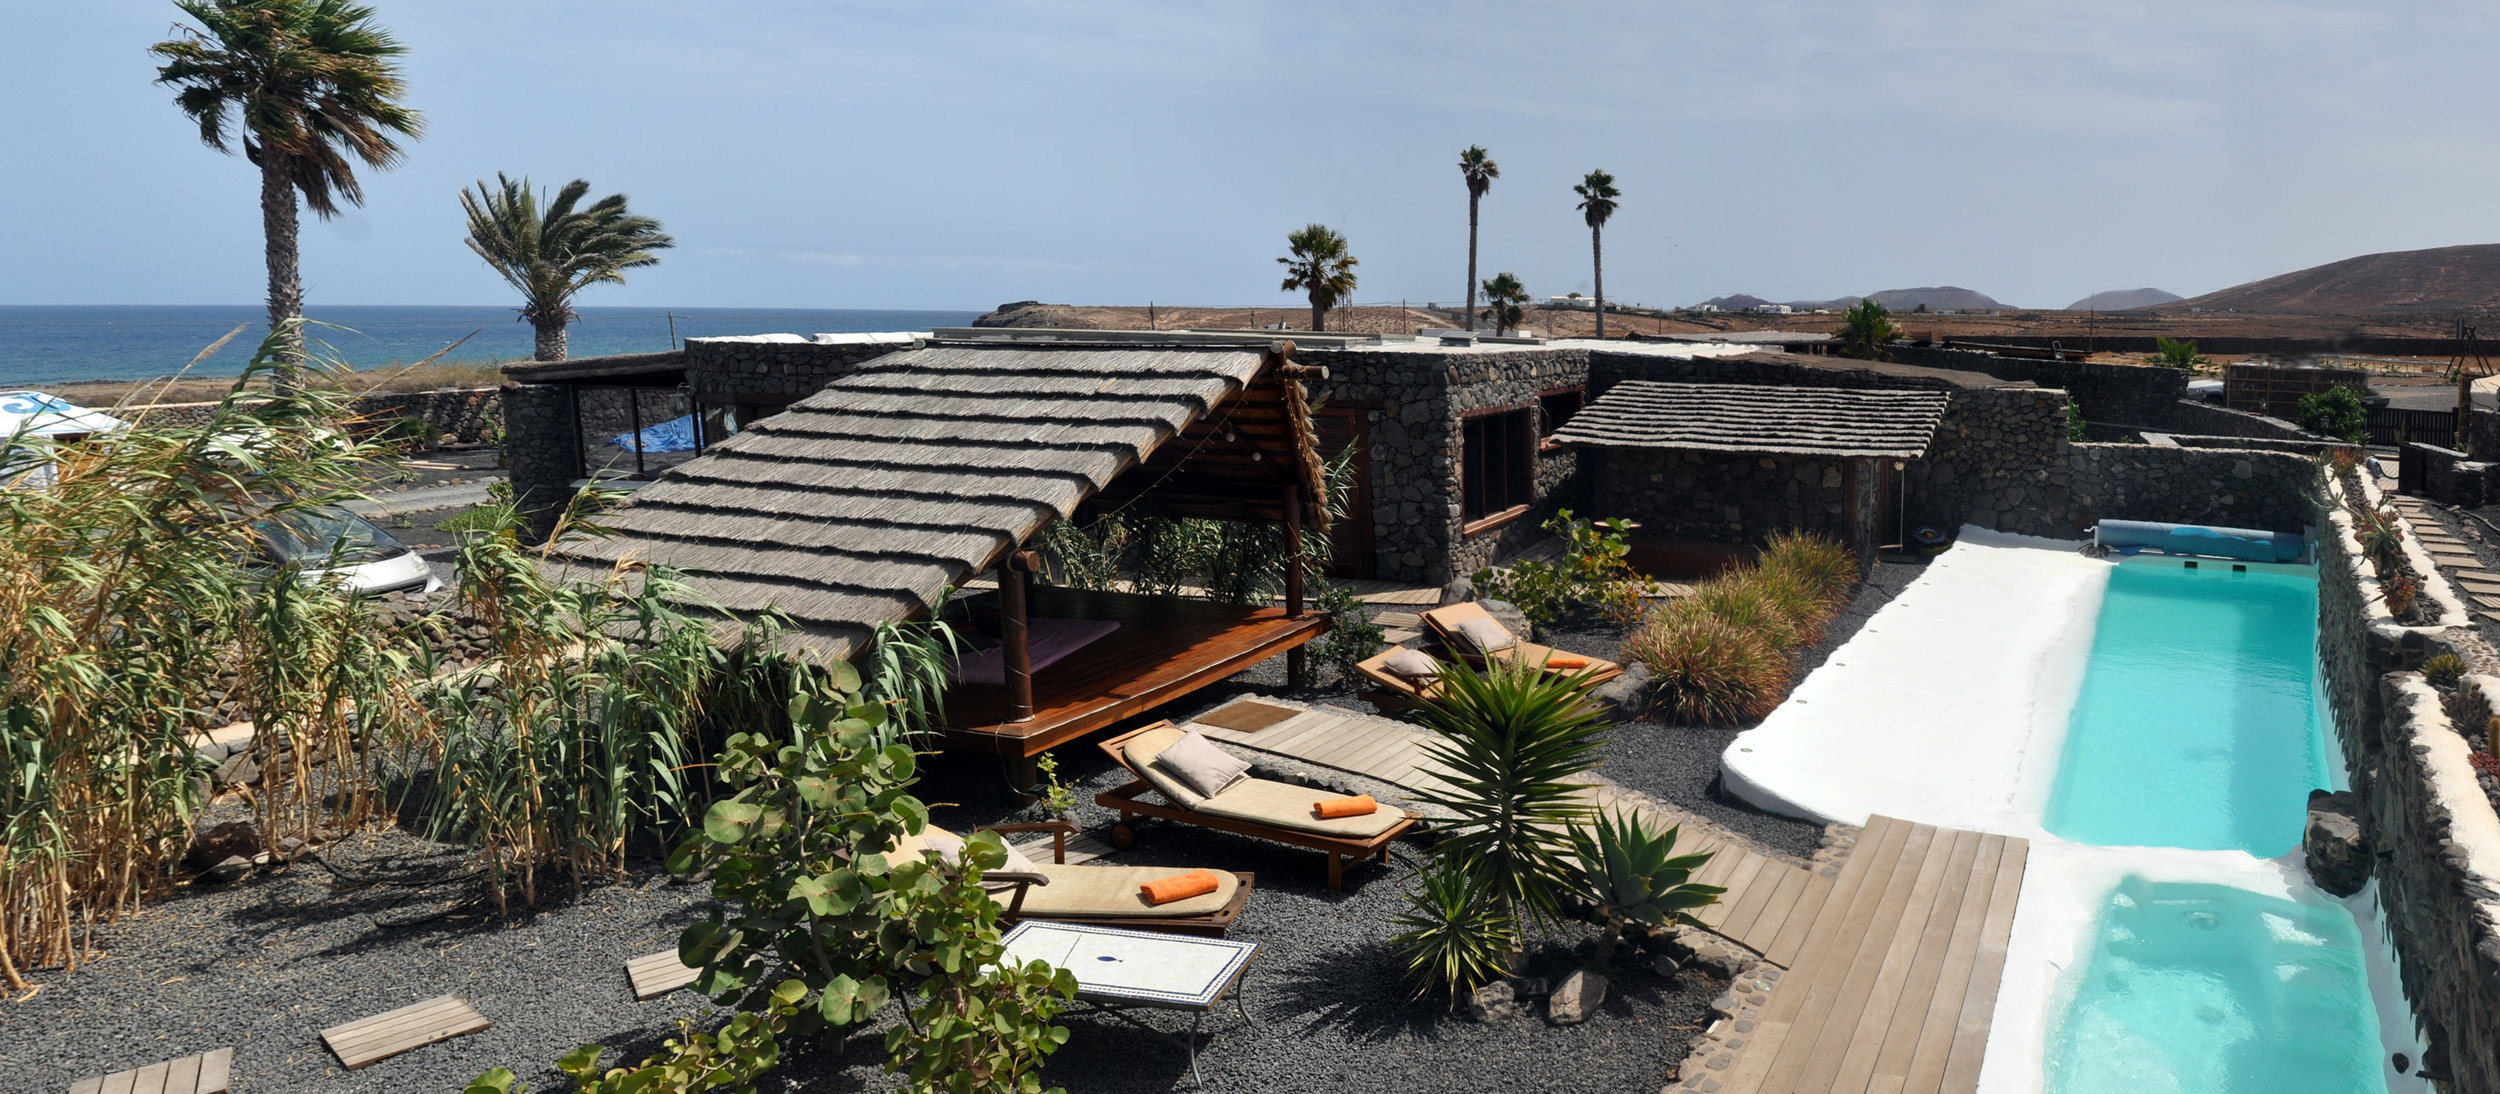 Finca de Arrieta - A resort for relaxation, exploration, and adventures